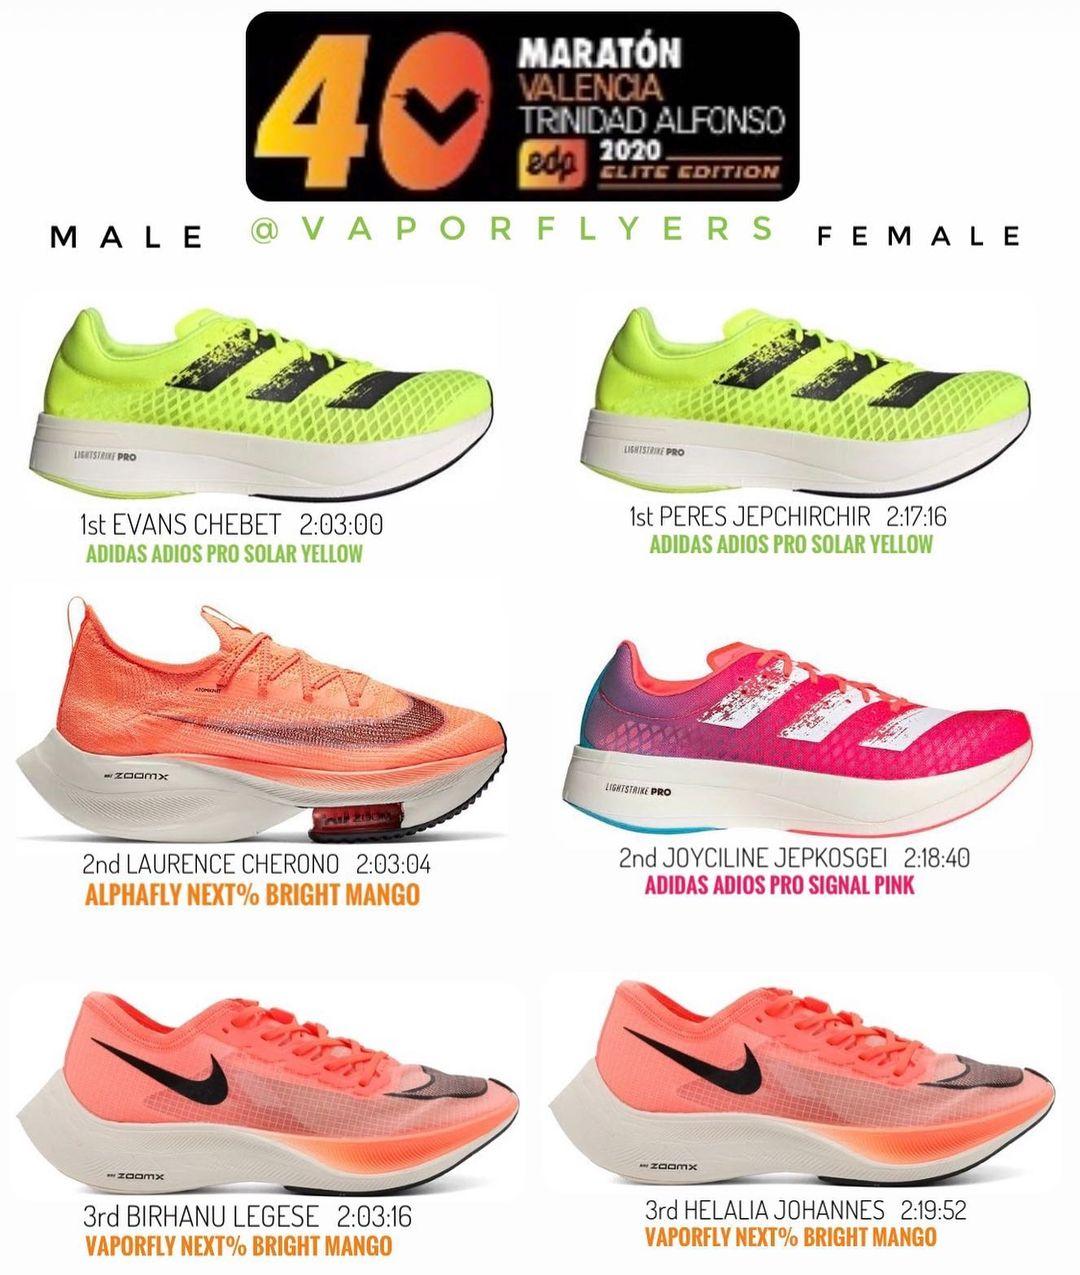 zapatillas maraton valencia 2020